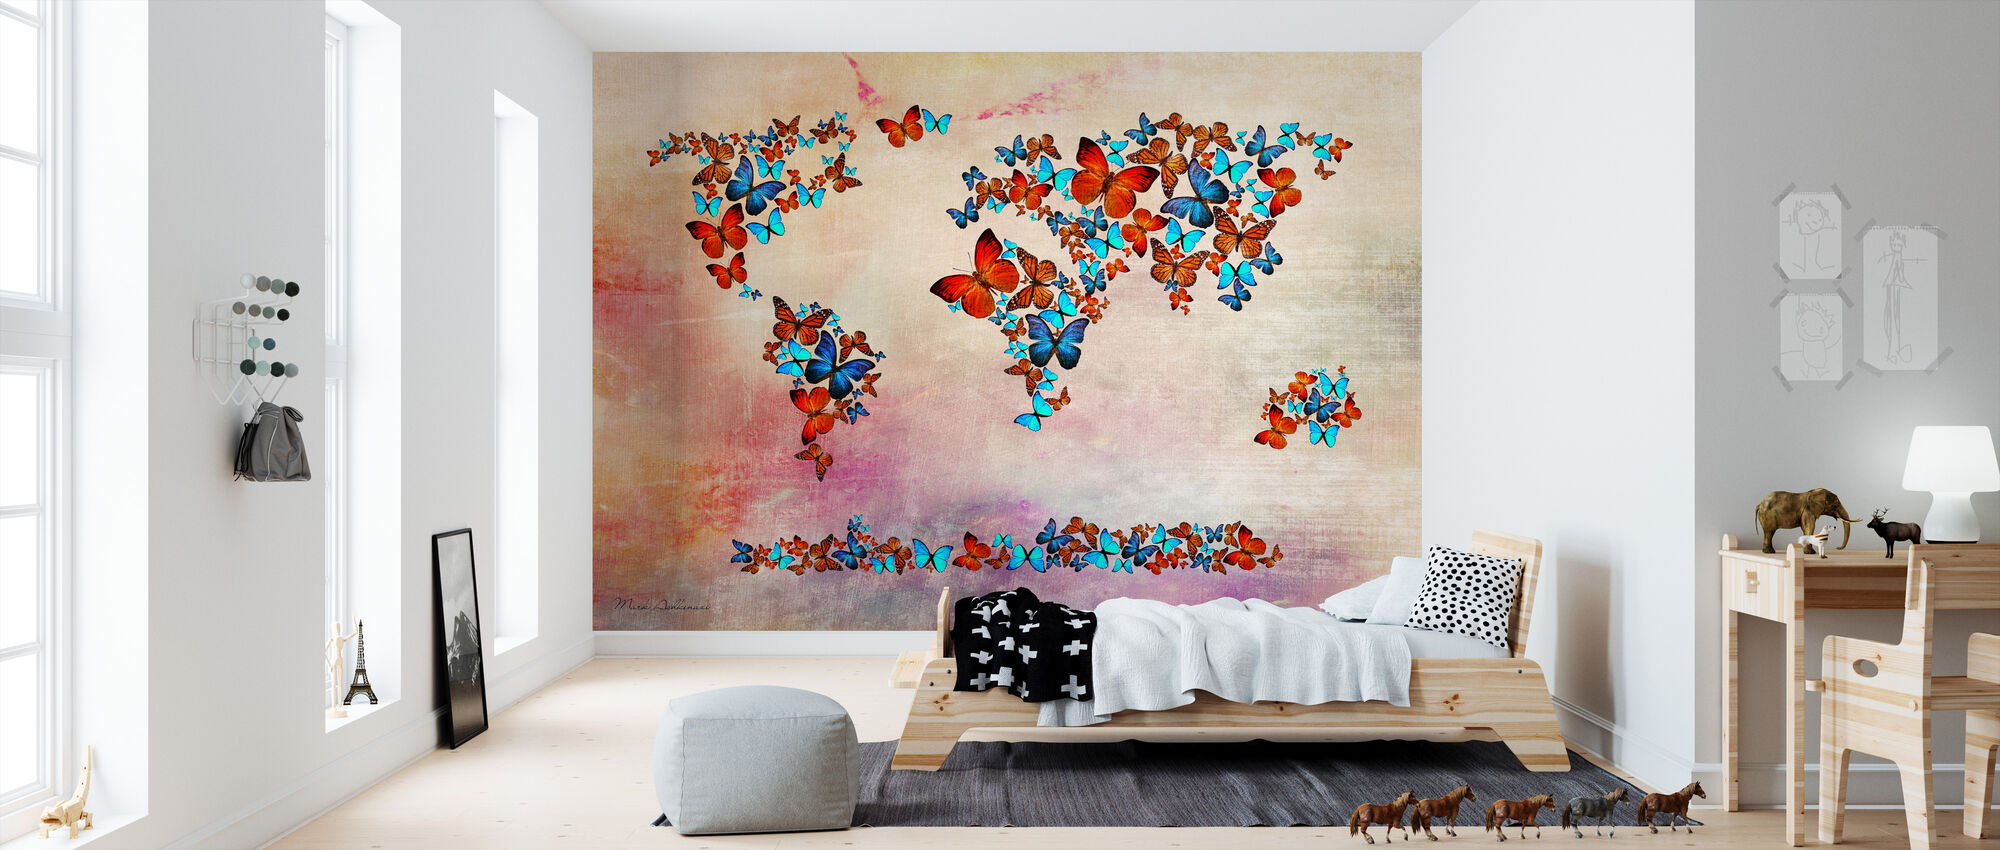 Vlinders vormen Wereld Kaart - Behang - Kinderkamer